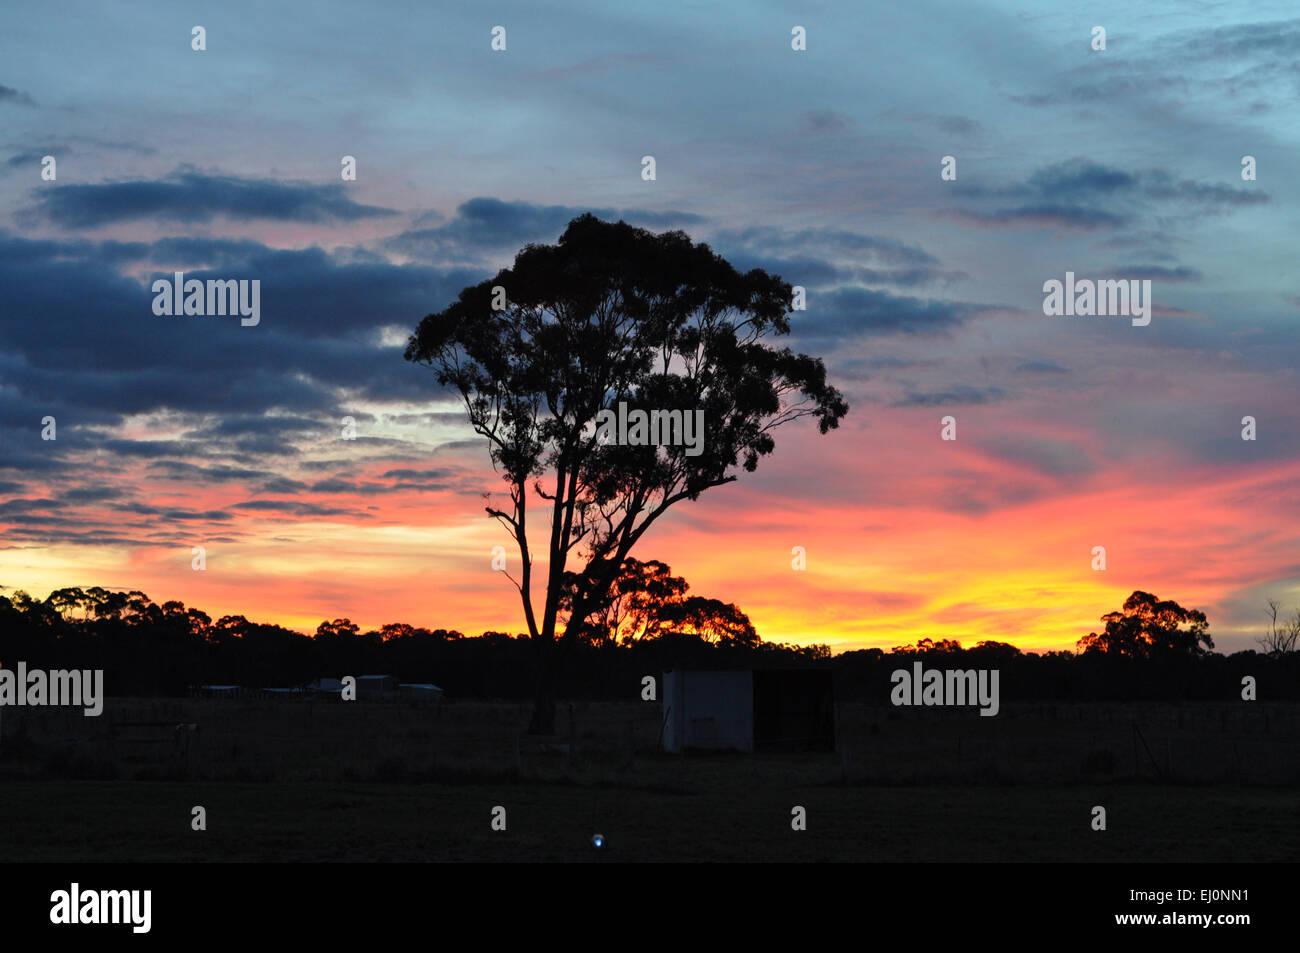 Silhouette of eucalyptus tree against bright coloured sunset in rural Australia. - Stock Image